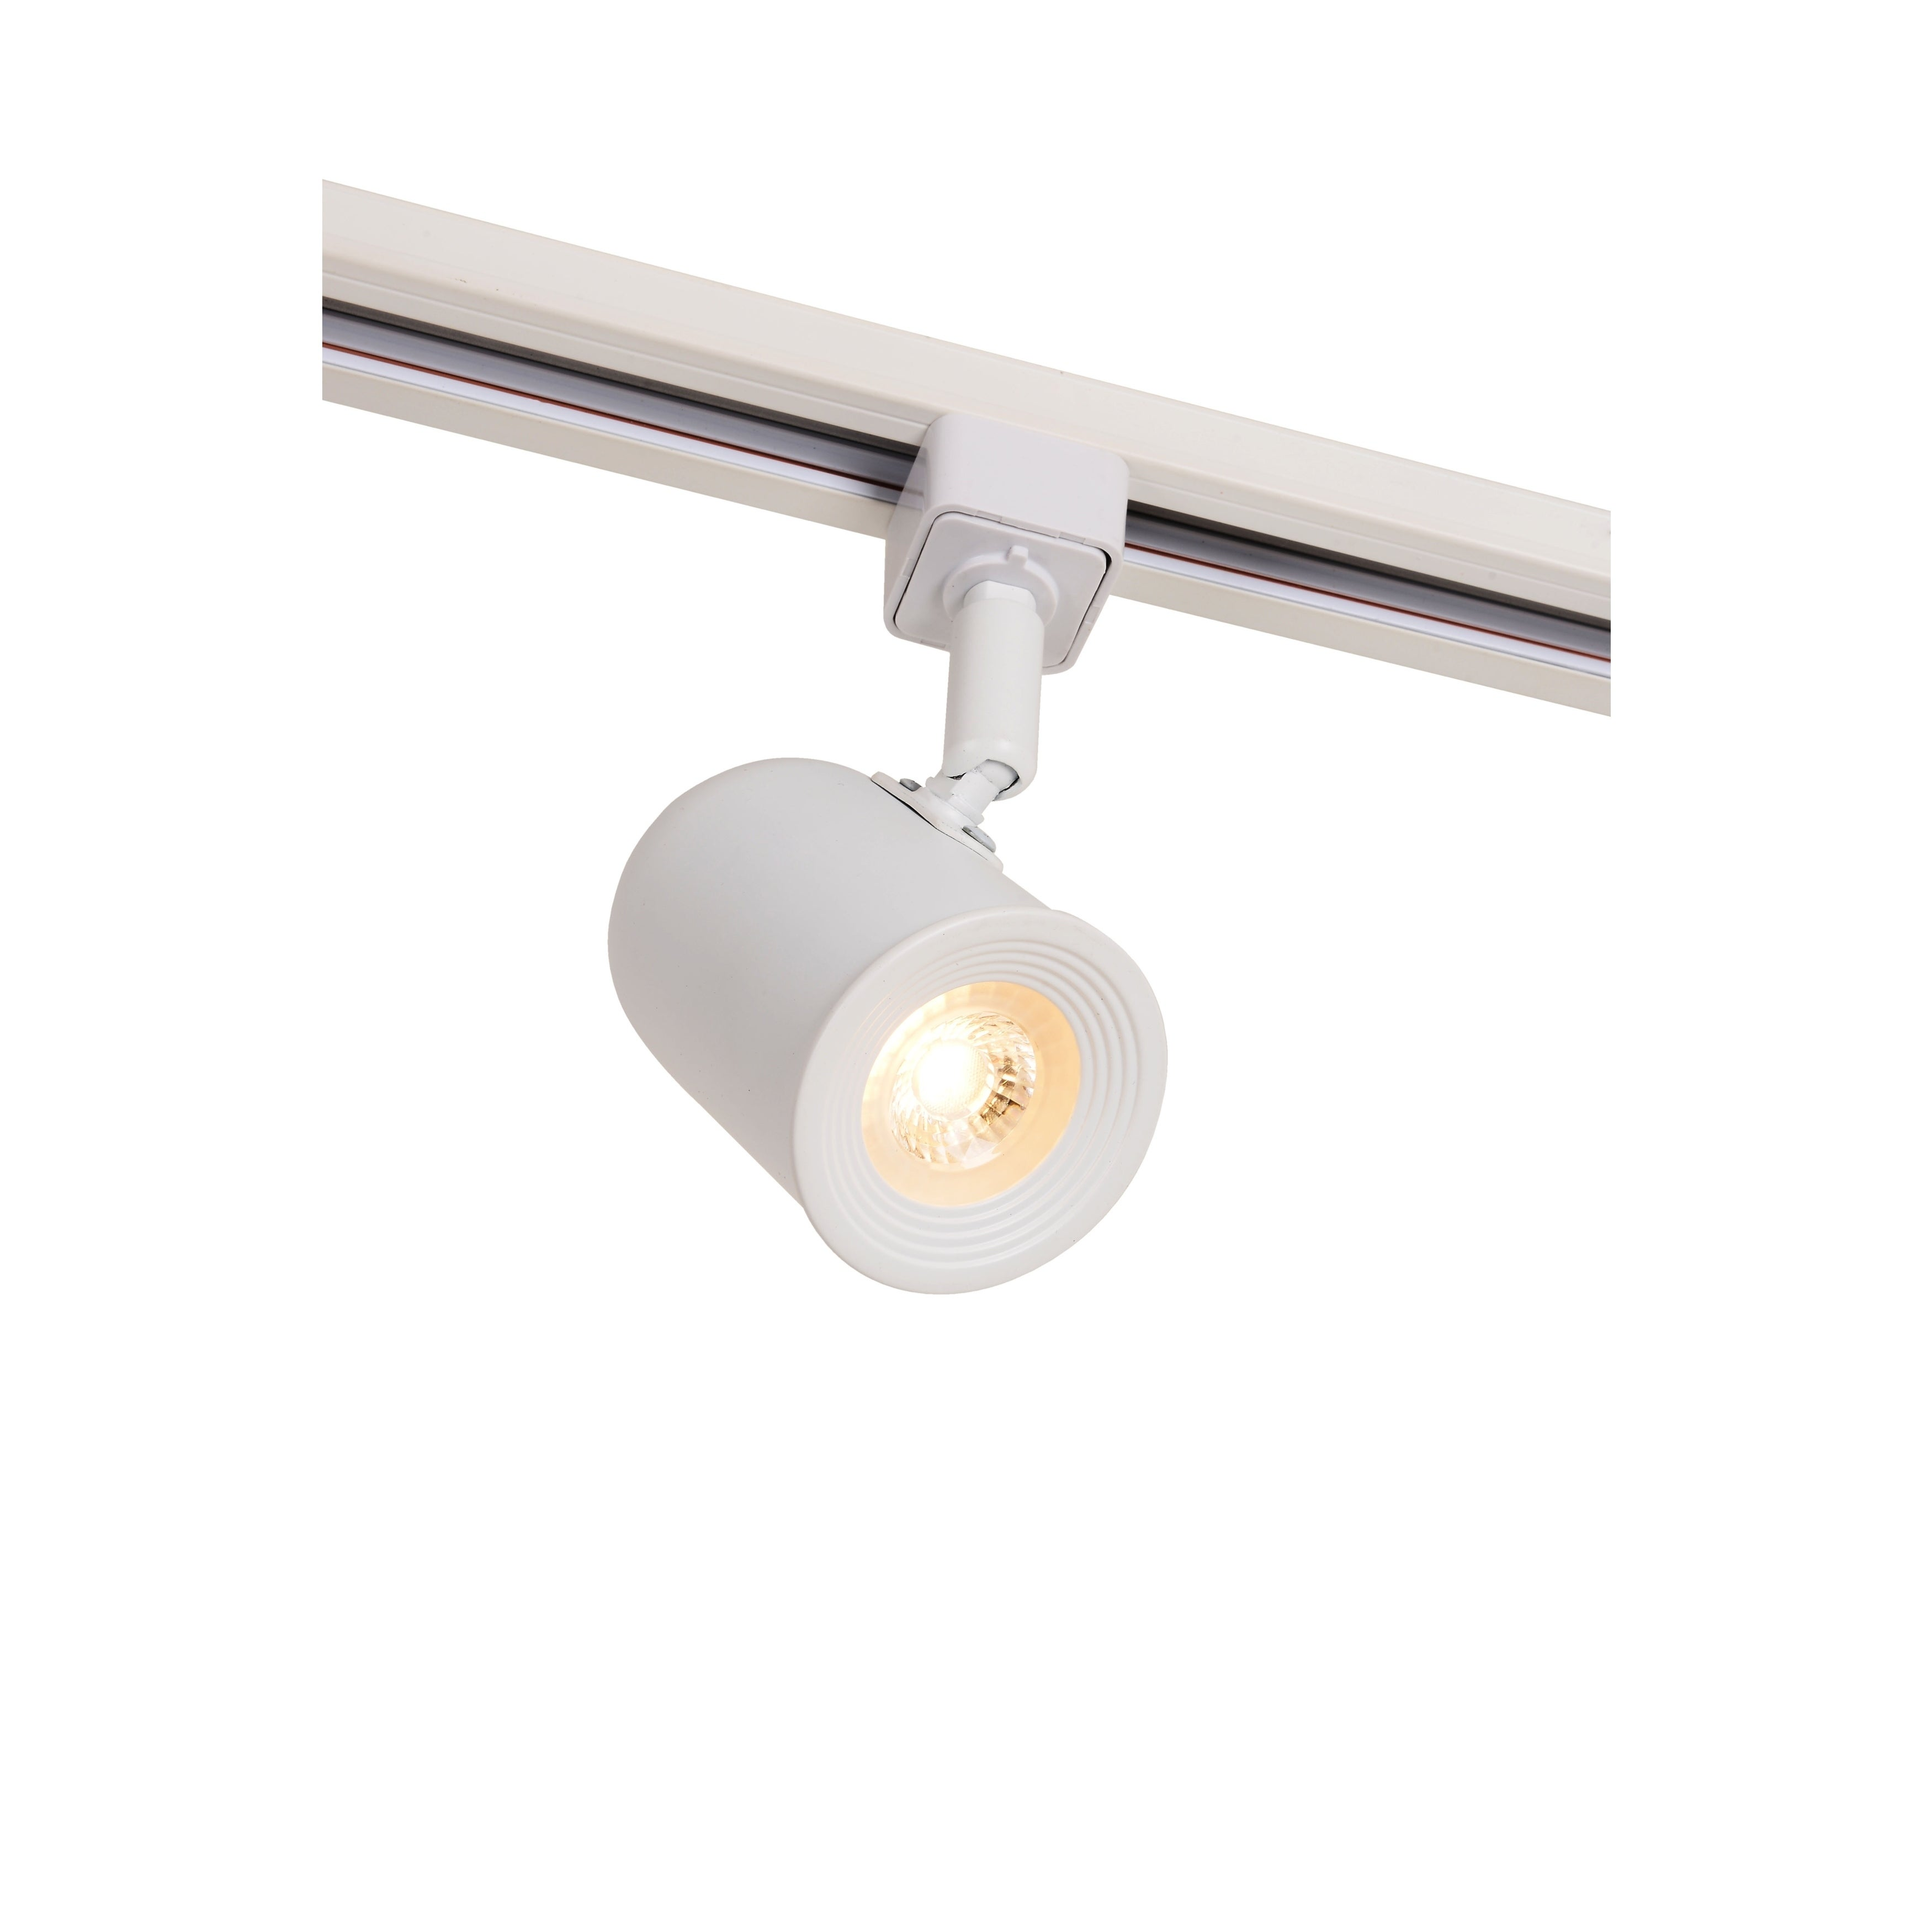 "Led Track Light Head White: Catalina Lighting White LED 1-Light 5"" Track Lighting Head"